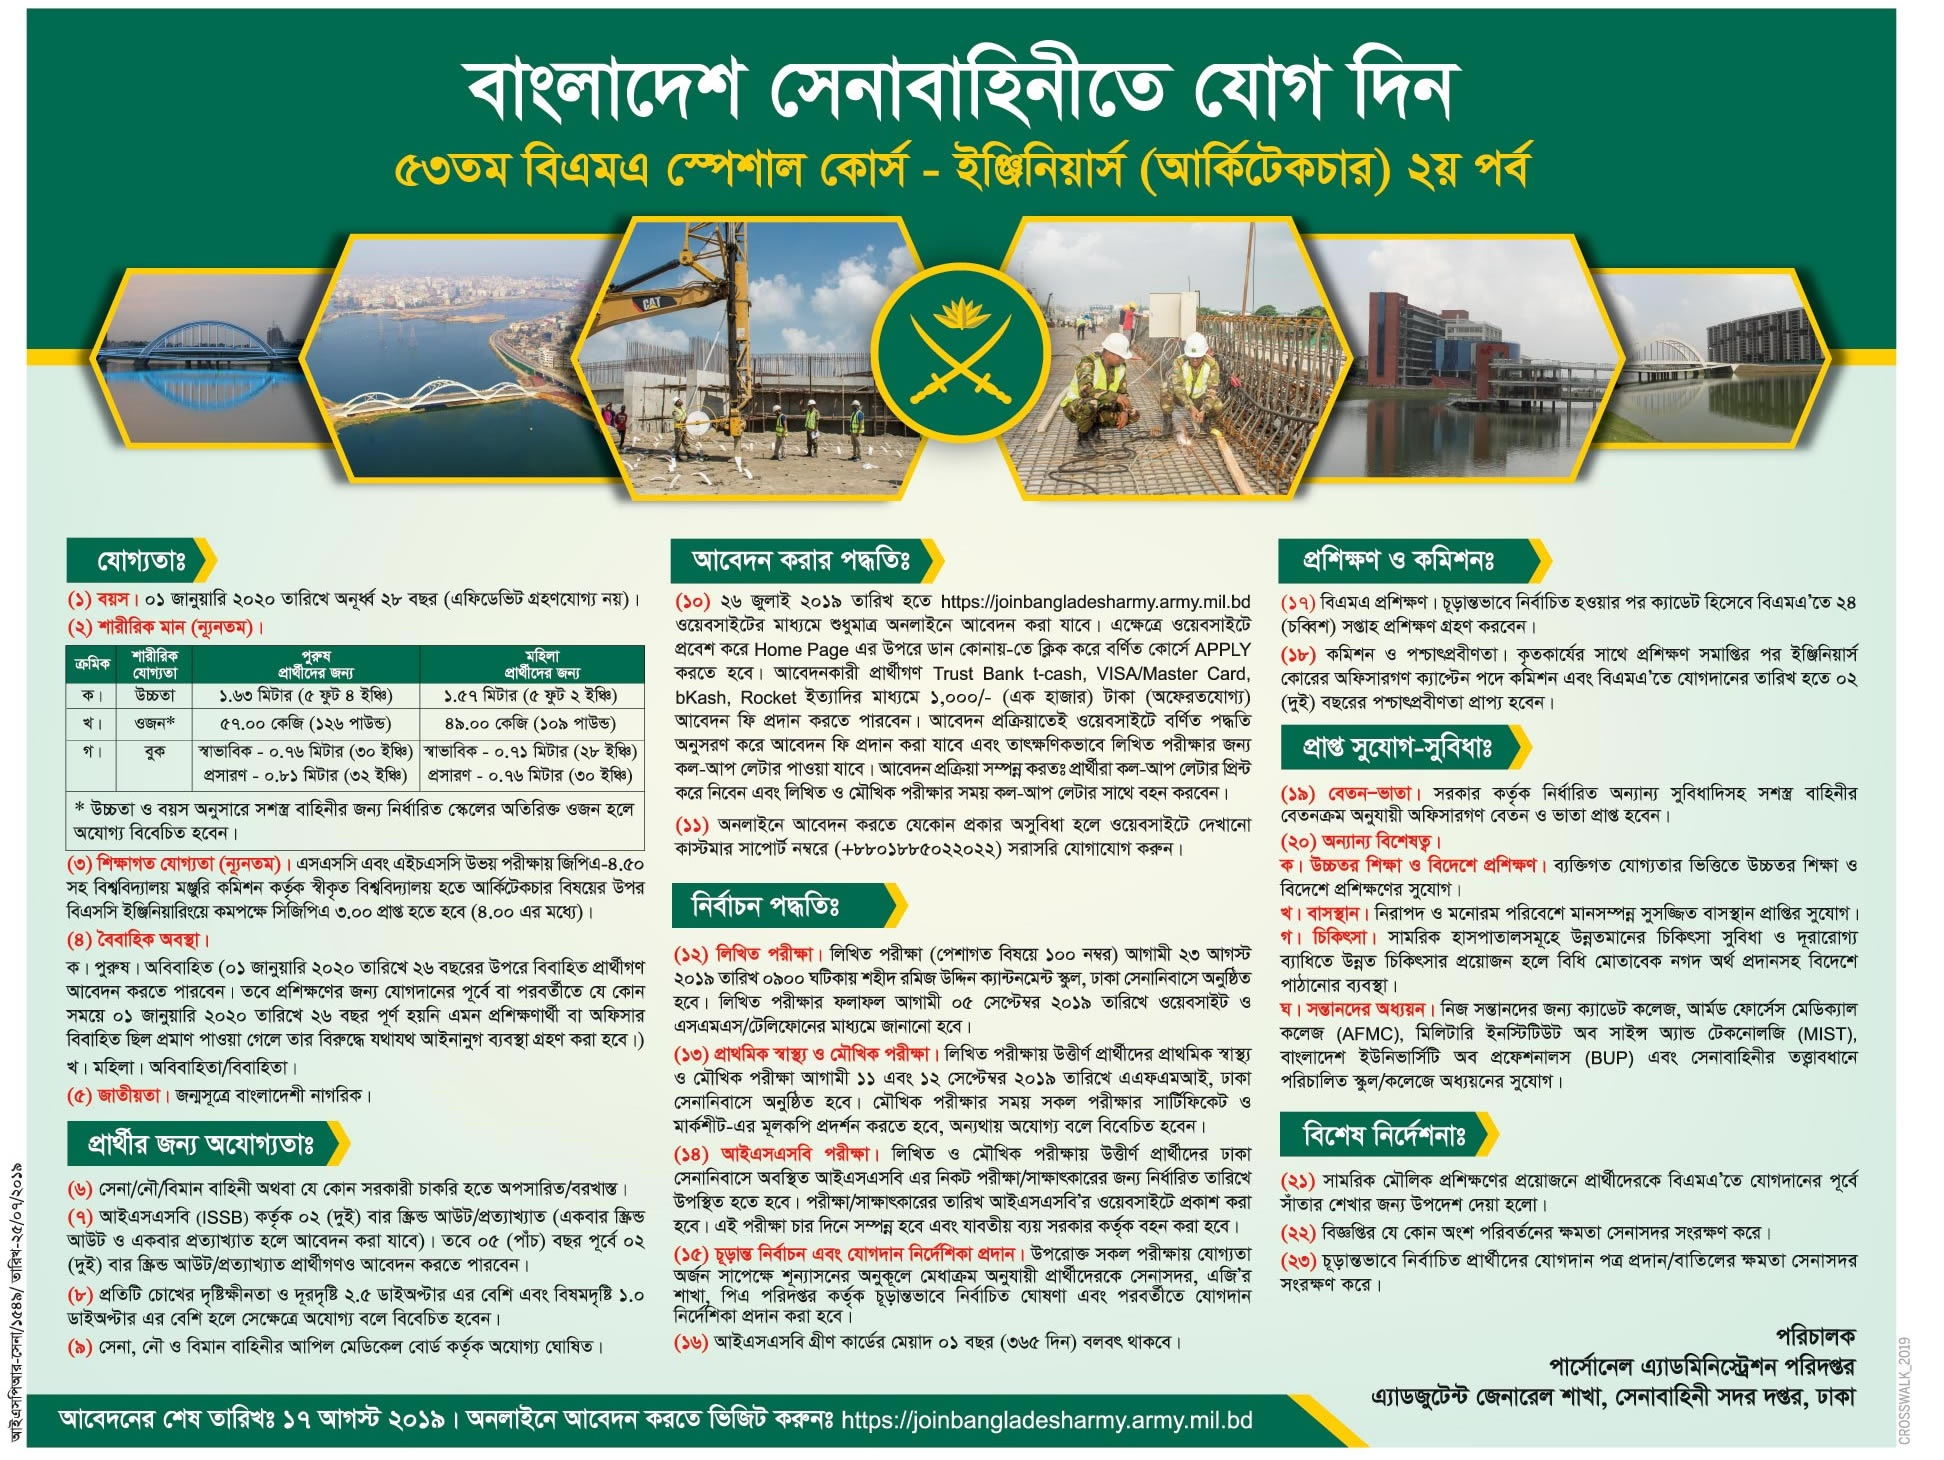 Bangladesh Army Job sCircular 2019